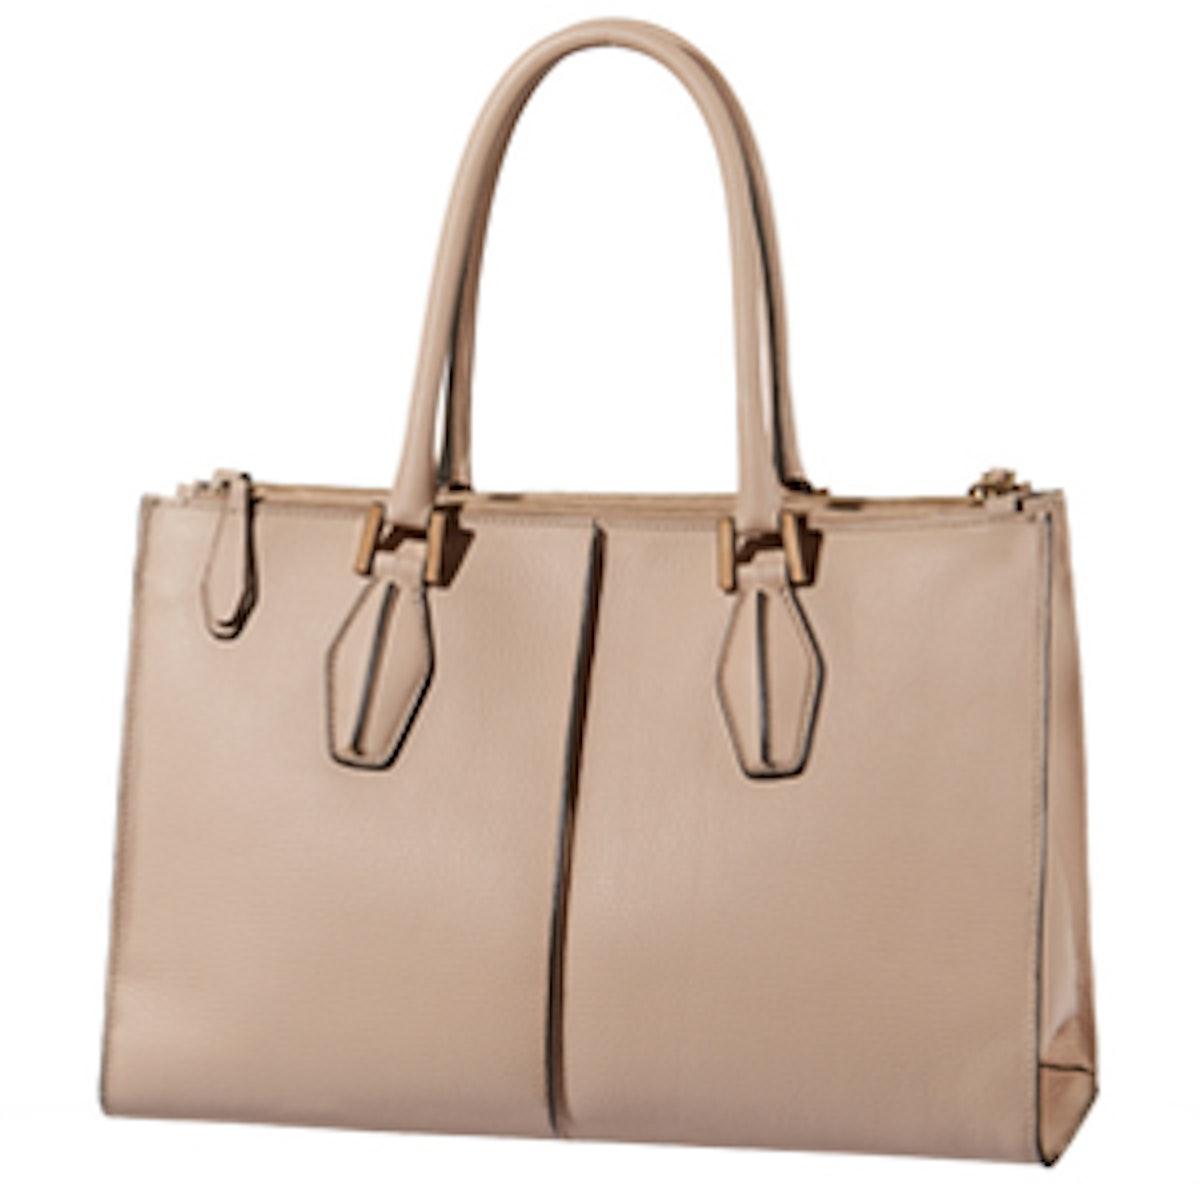 D-Cube Medium Shopping Bag